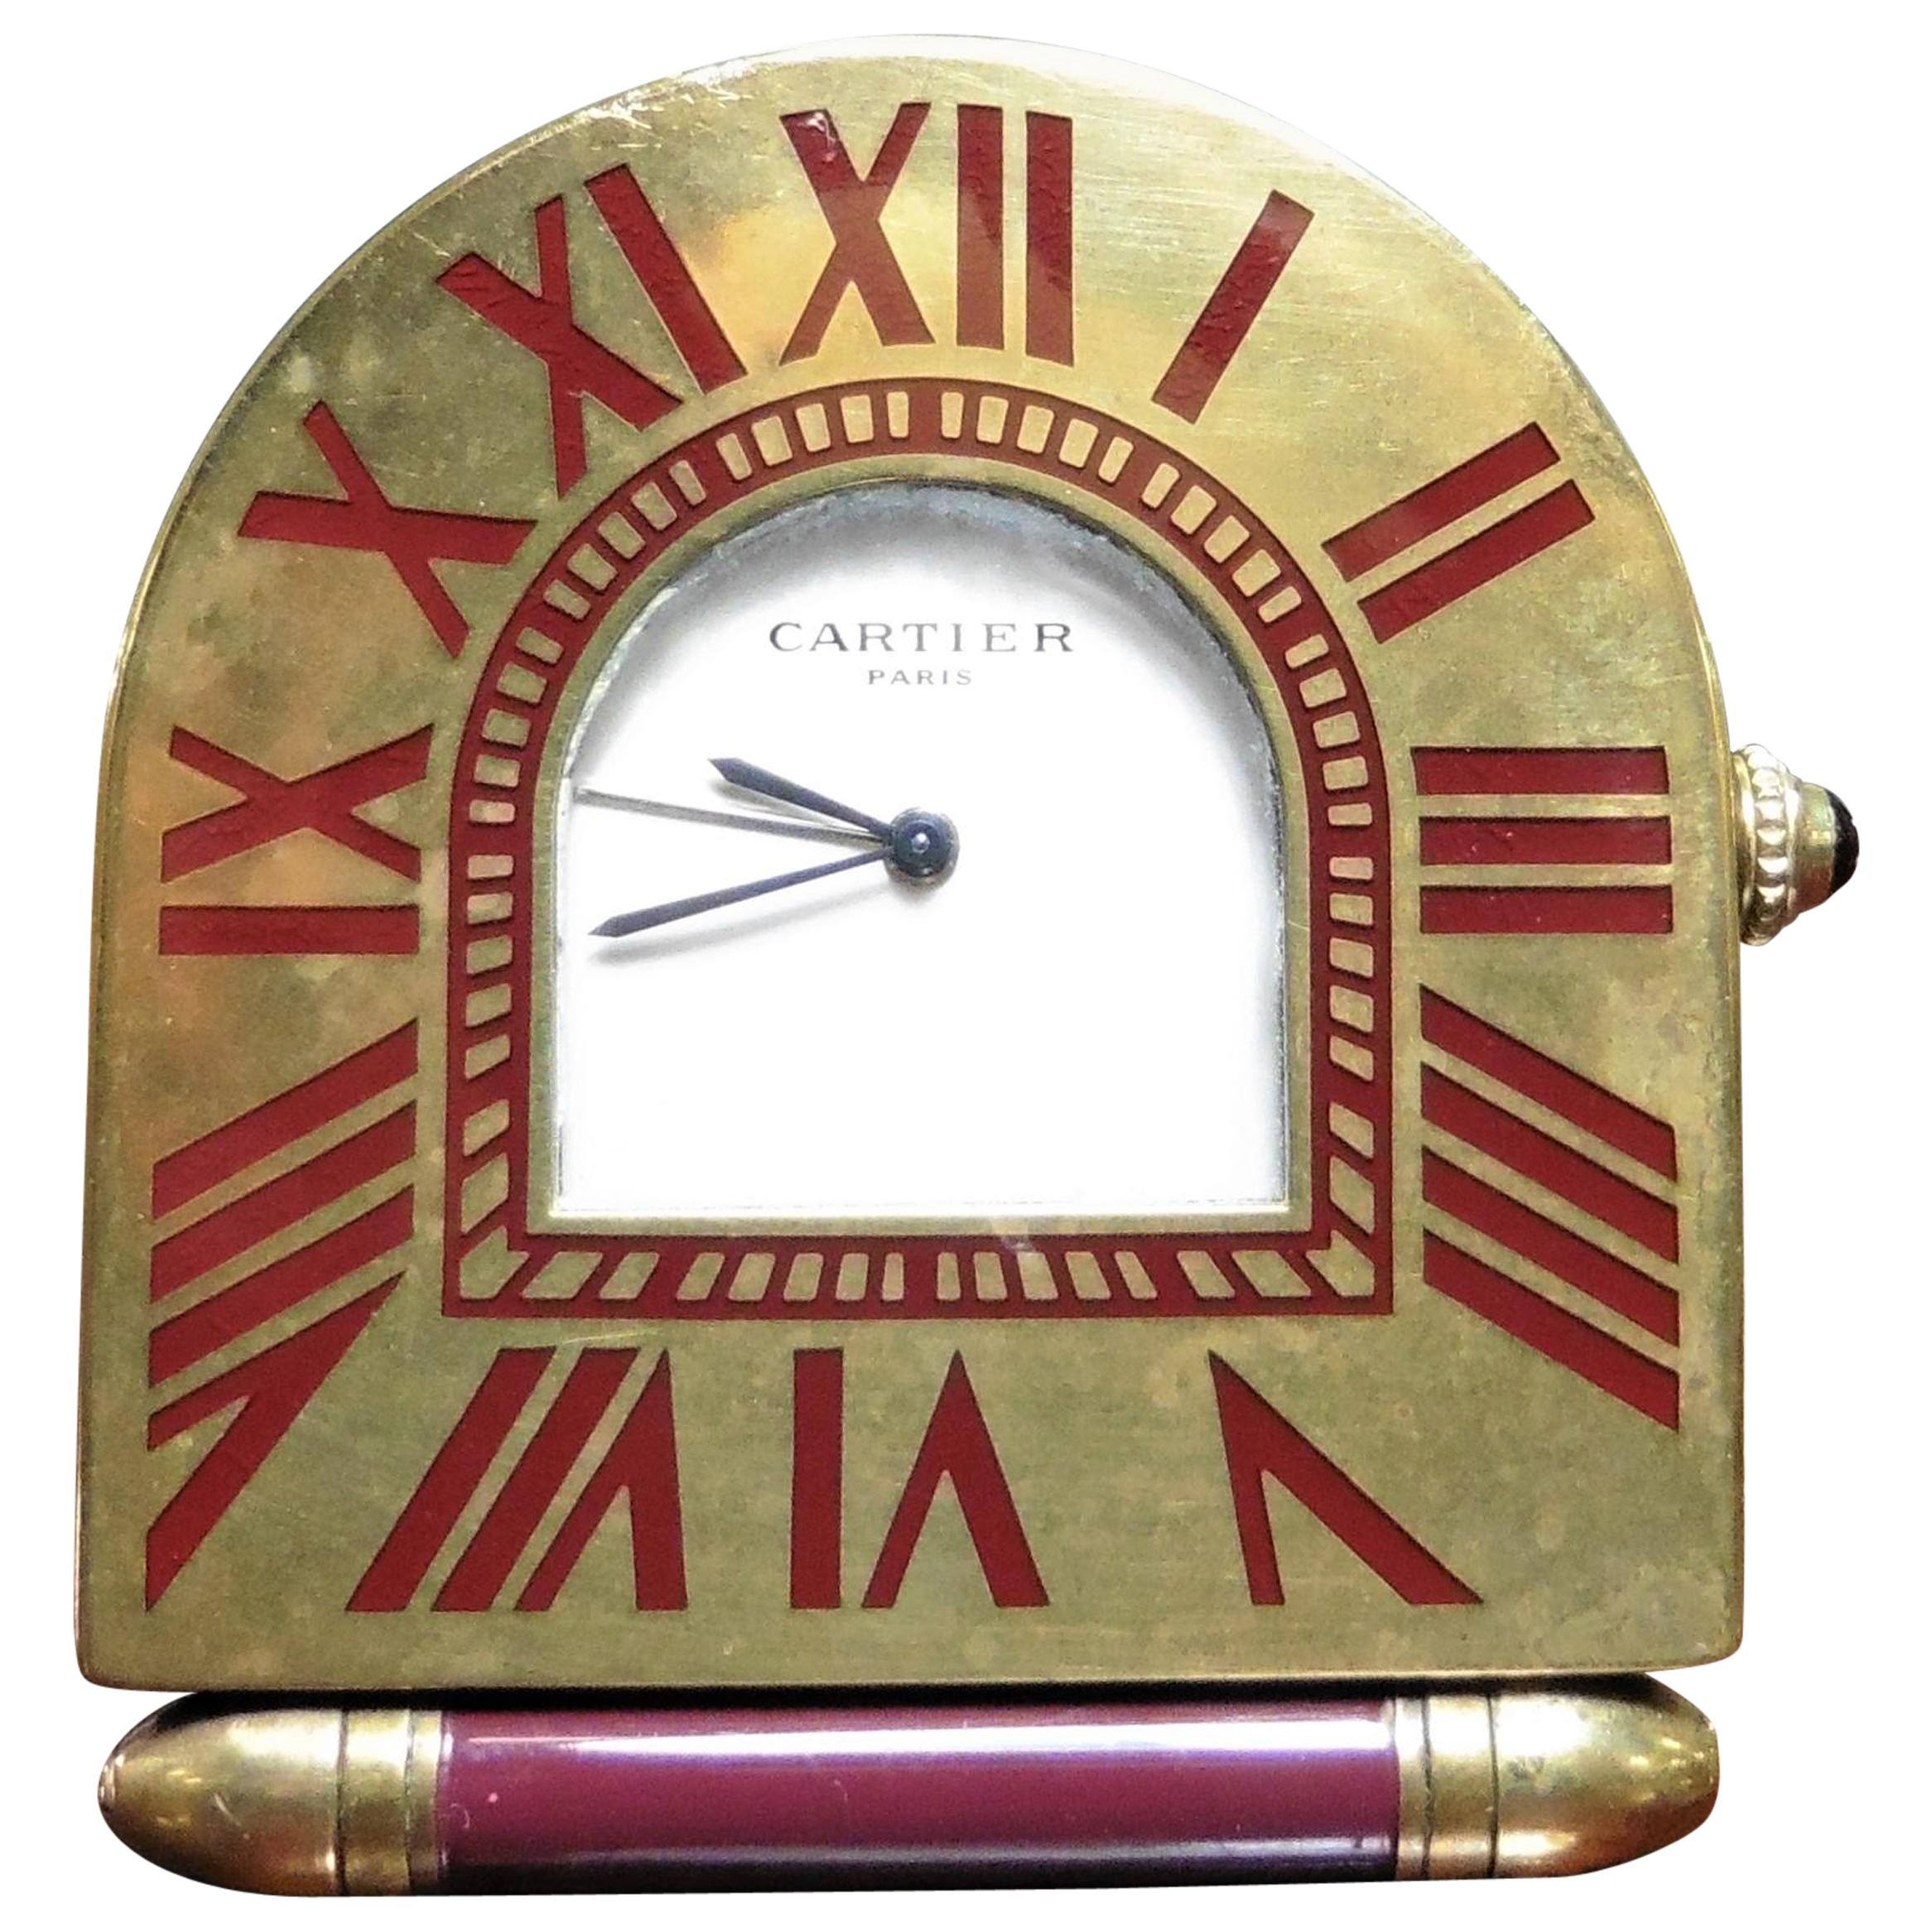 Cartier Art Deco Style Travel Clock